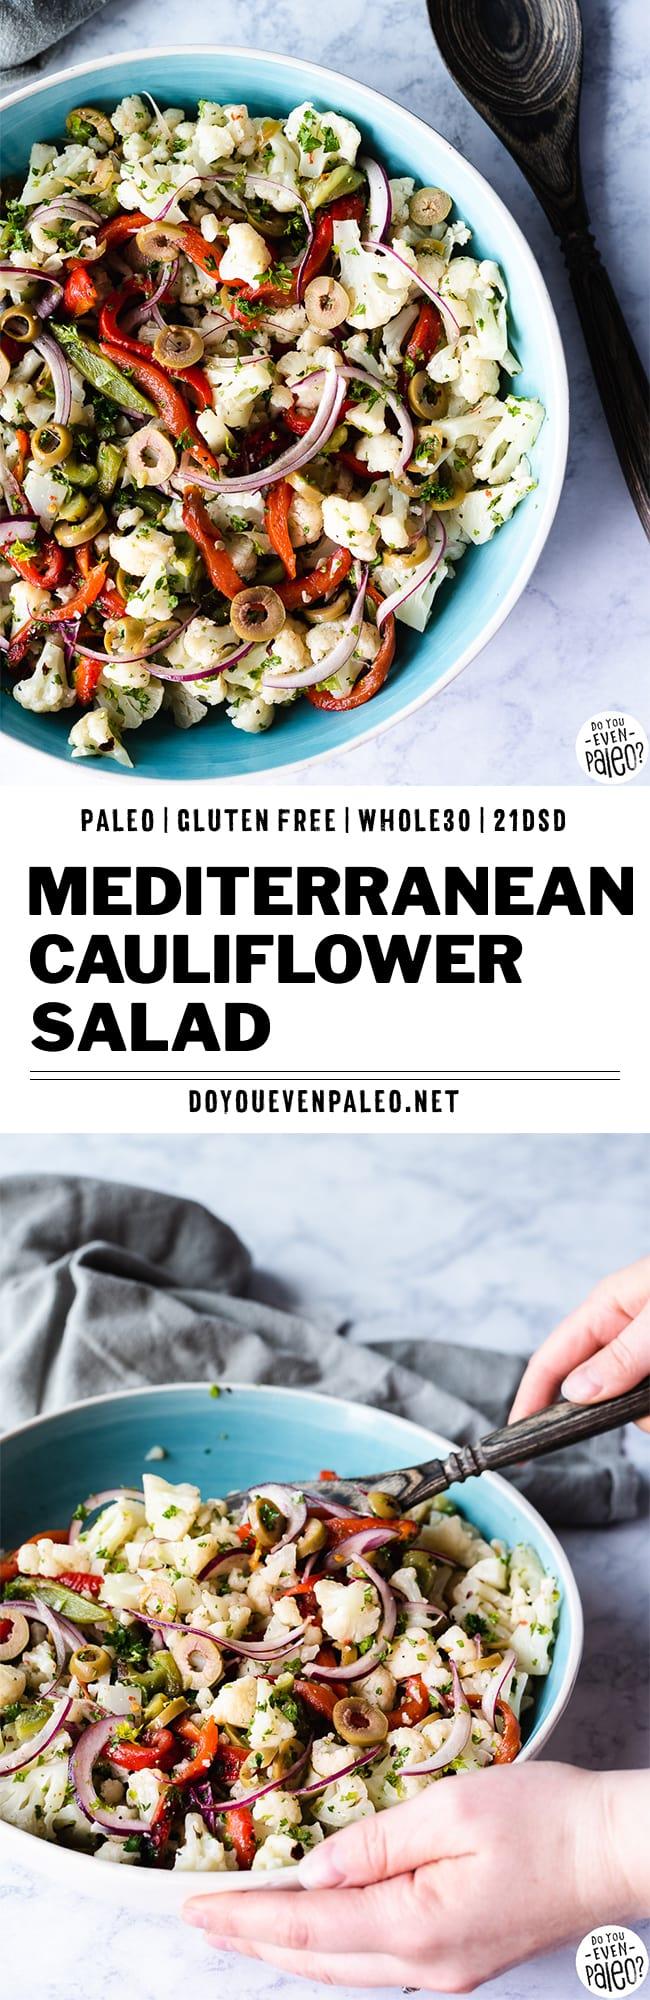 Mediterranean Cauliflower Salad Recipe | DoYouEvenPaleo.net